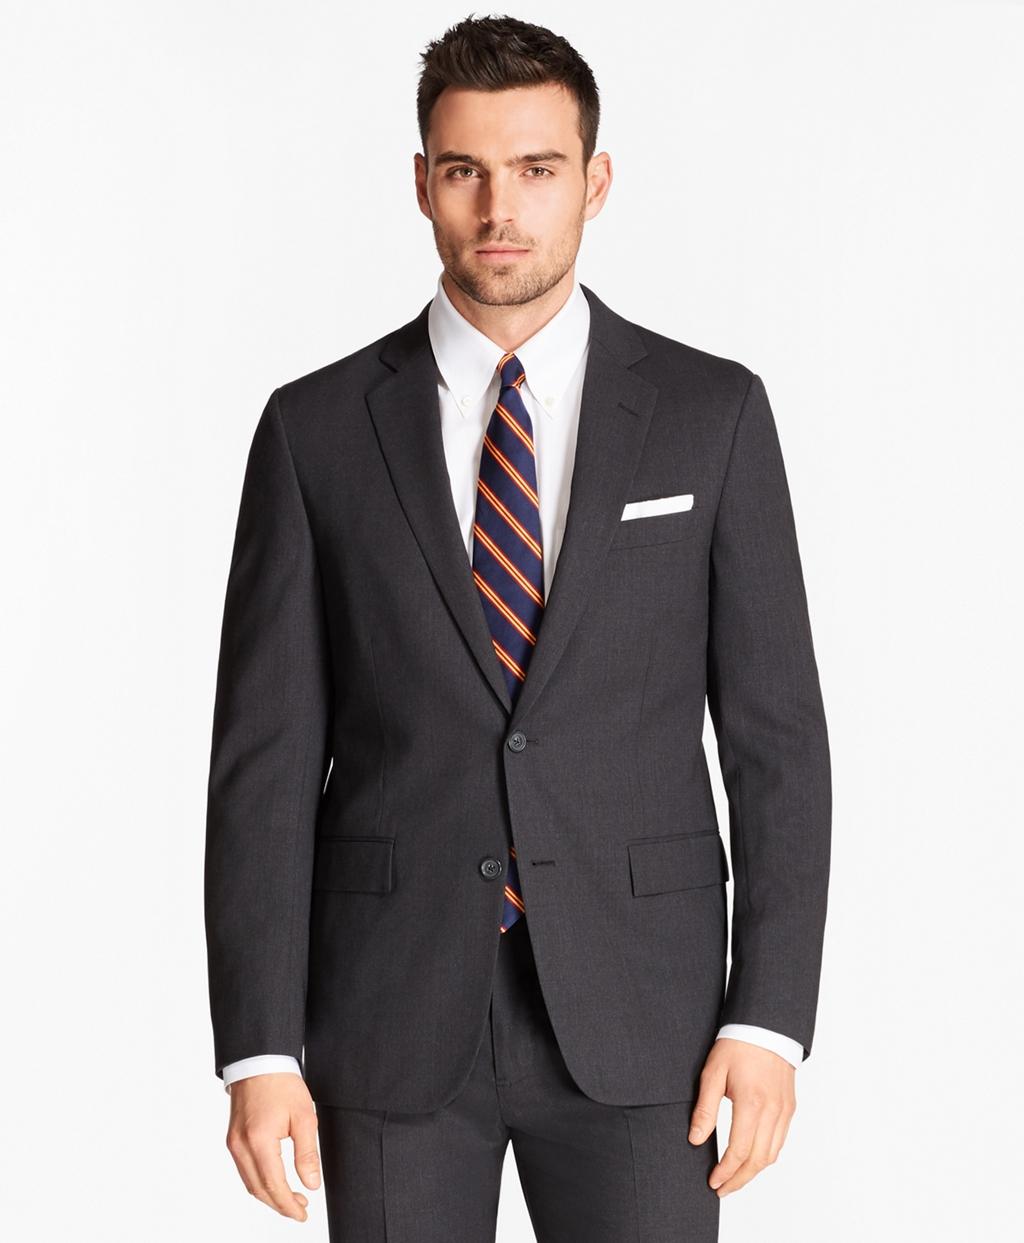 3dca5f3a412 Regent Fit BrooksCool® Suit - Brooks Brothers